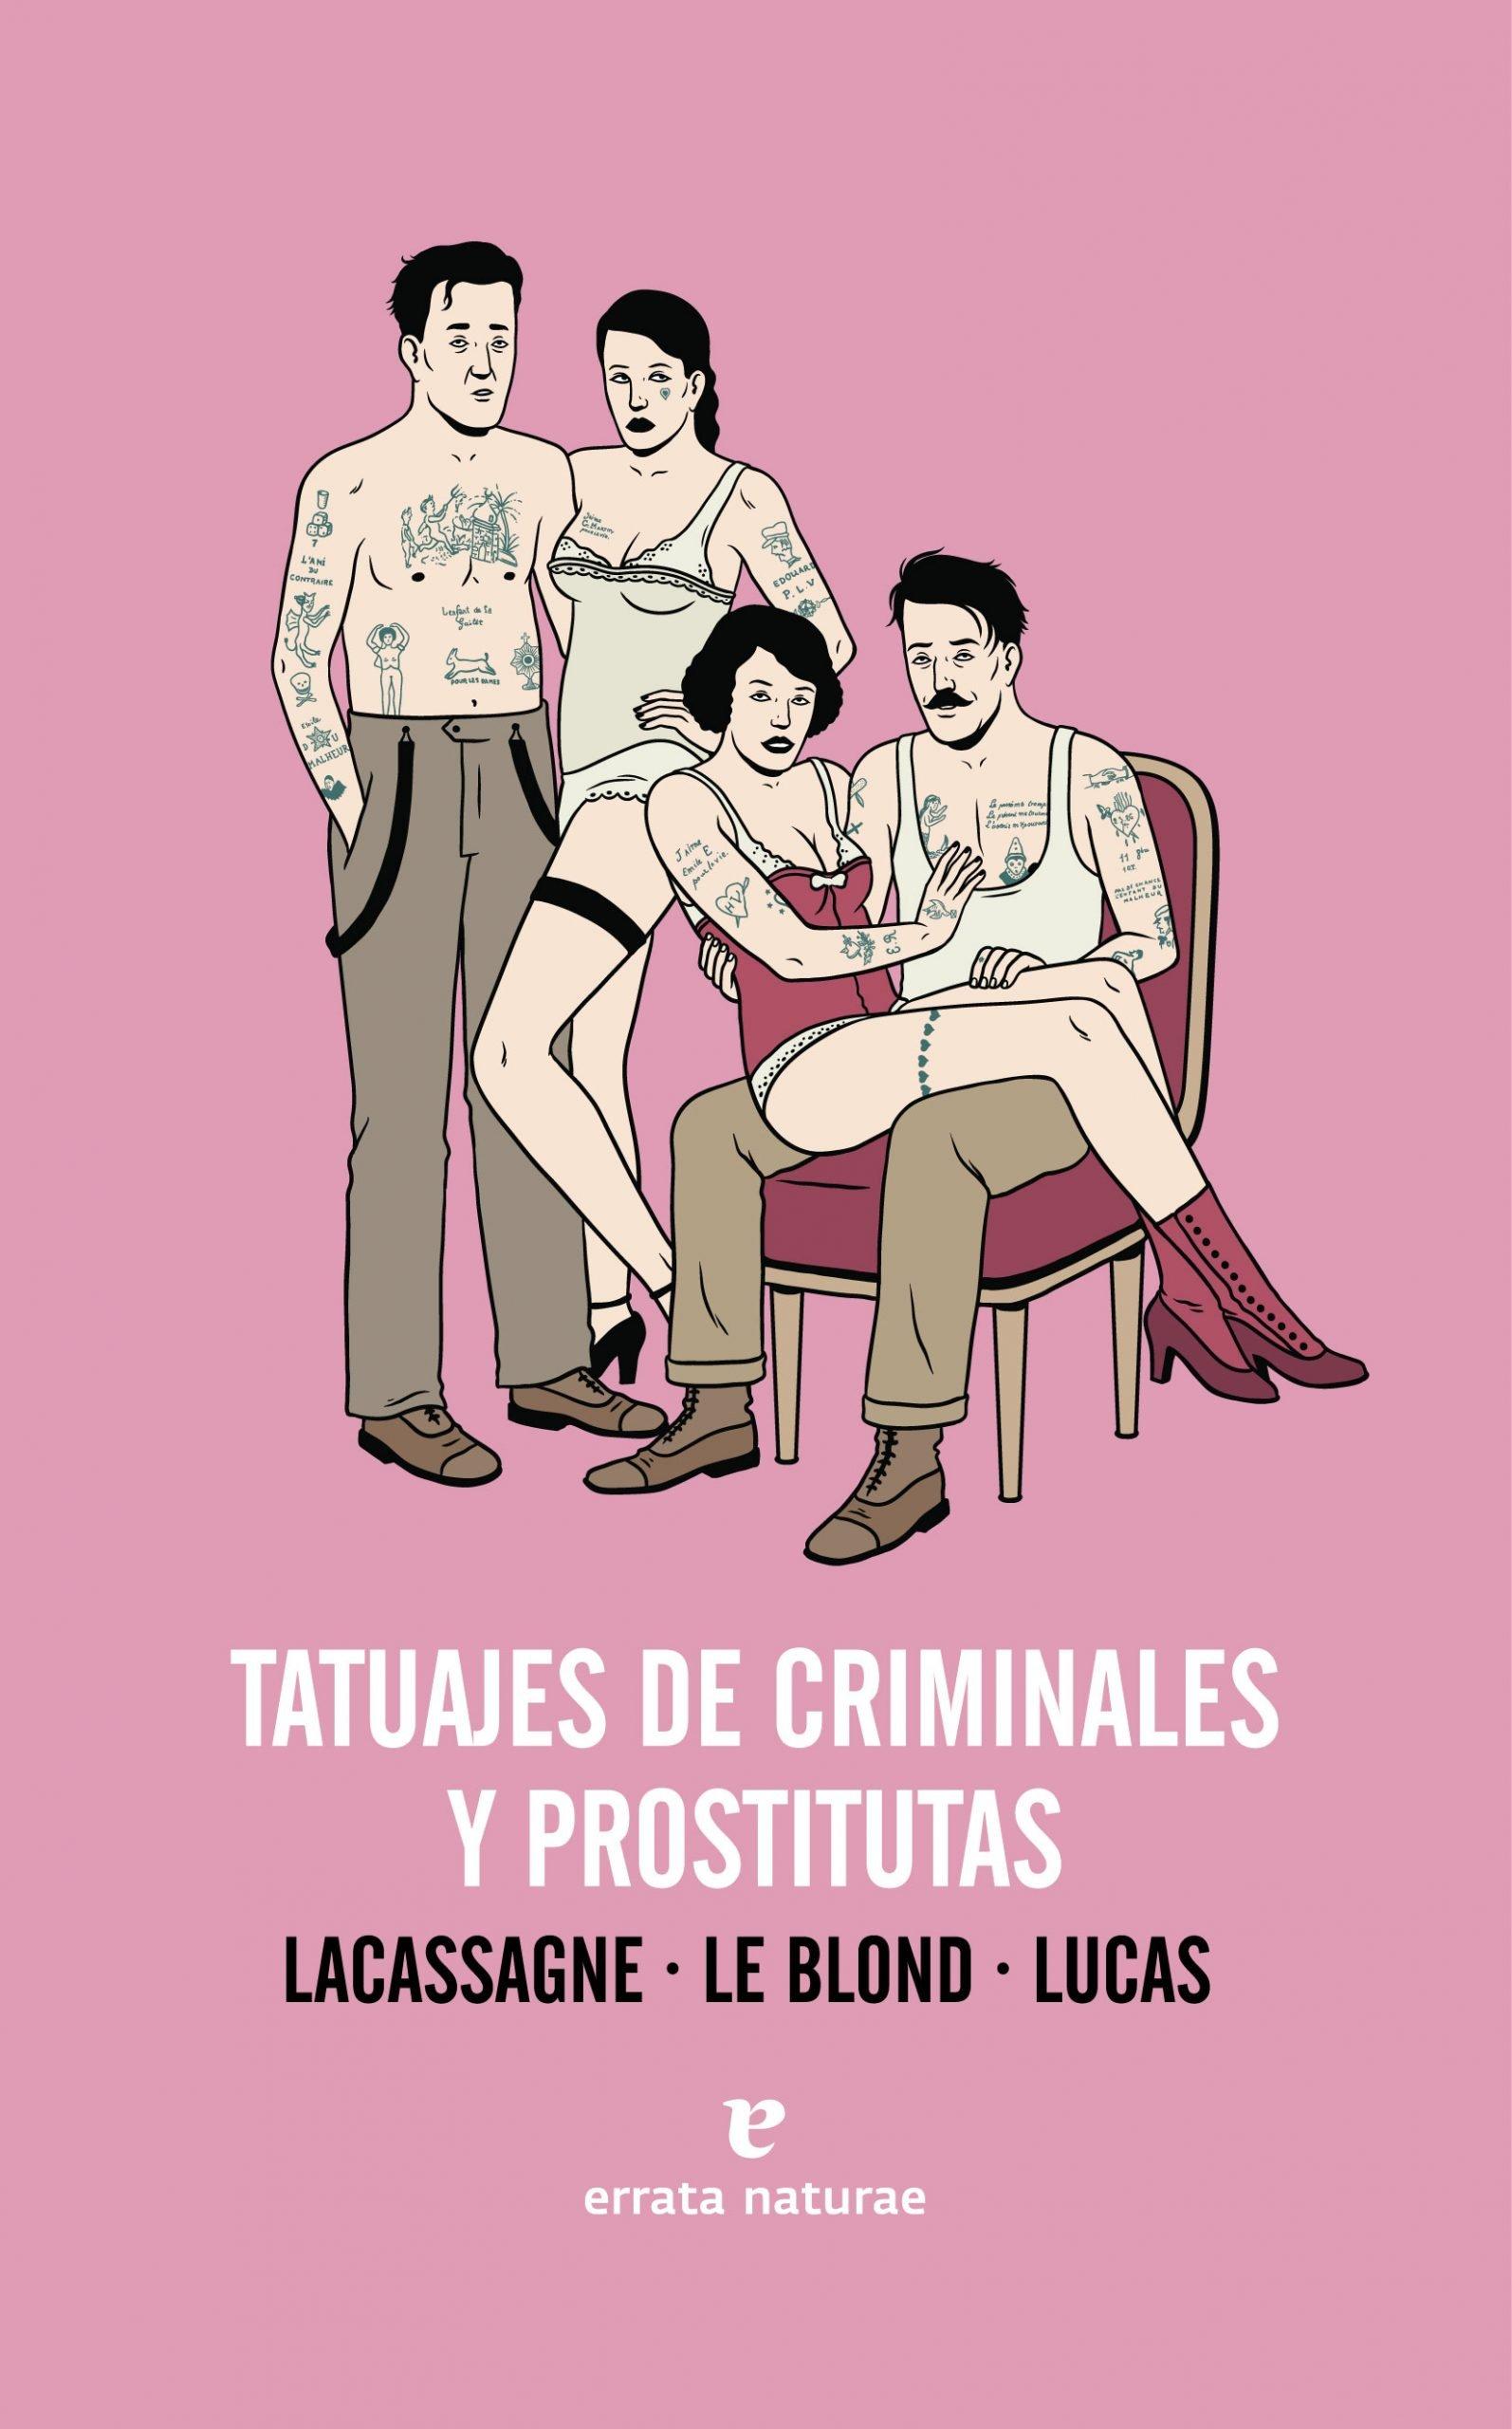 Portada-Tatuajes-de-criminales-y-prostitutas